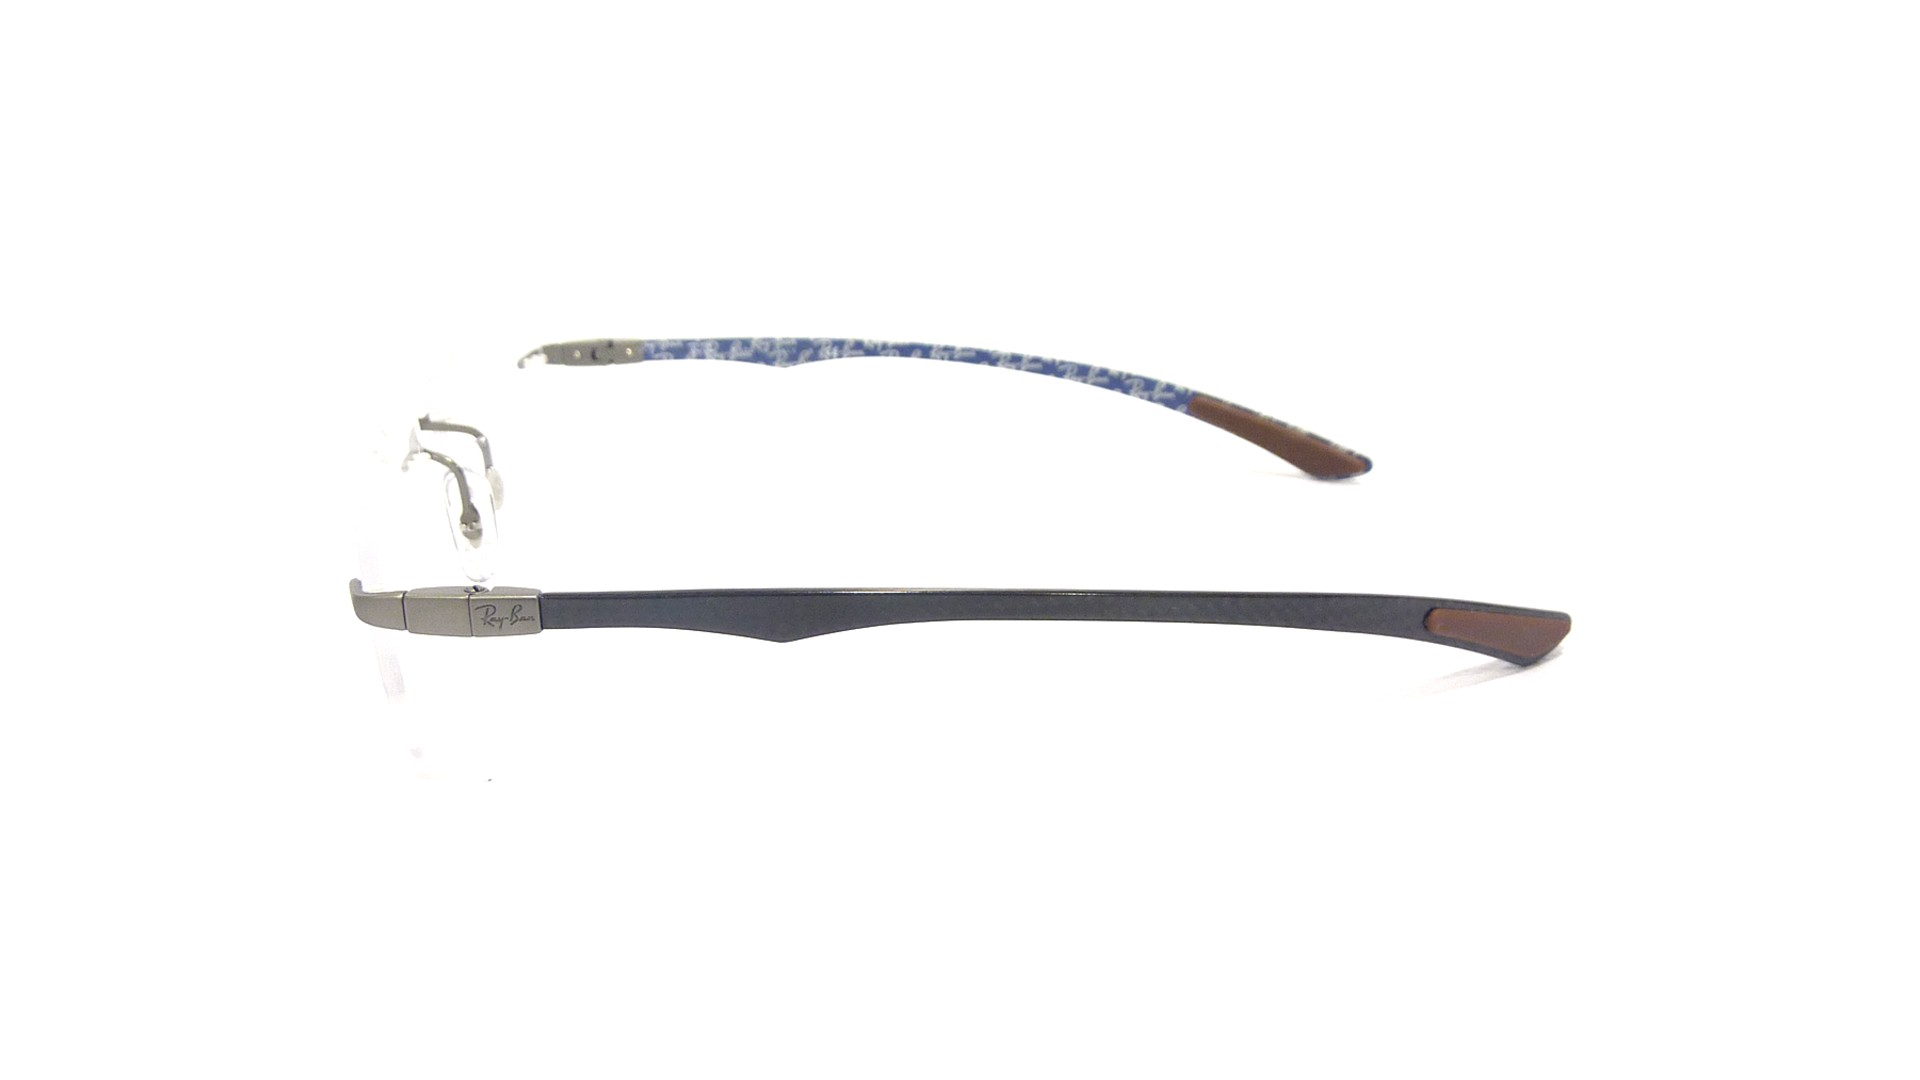 e8bbea1841 Ray Ban RB 8404 2701 Carbon Fiber Rimless Eyeglasses Frames 53mm - 40